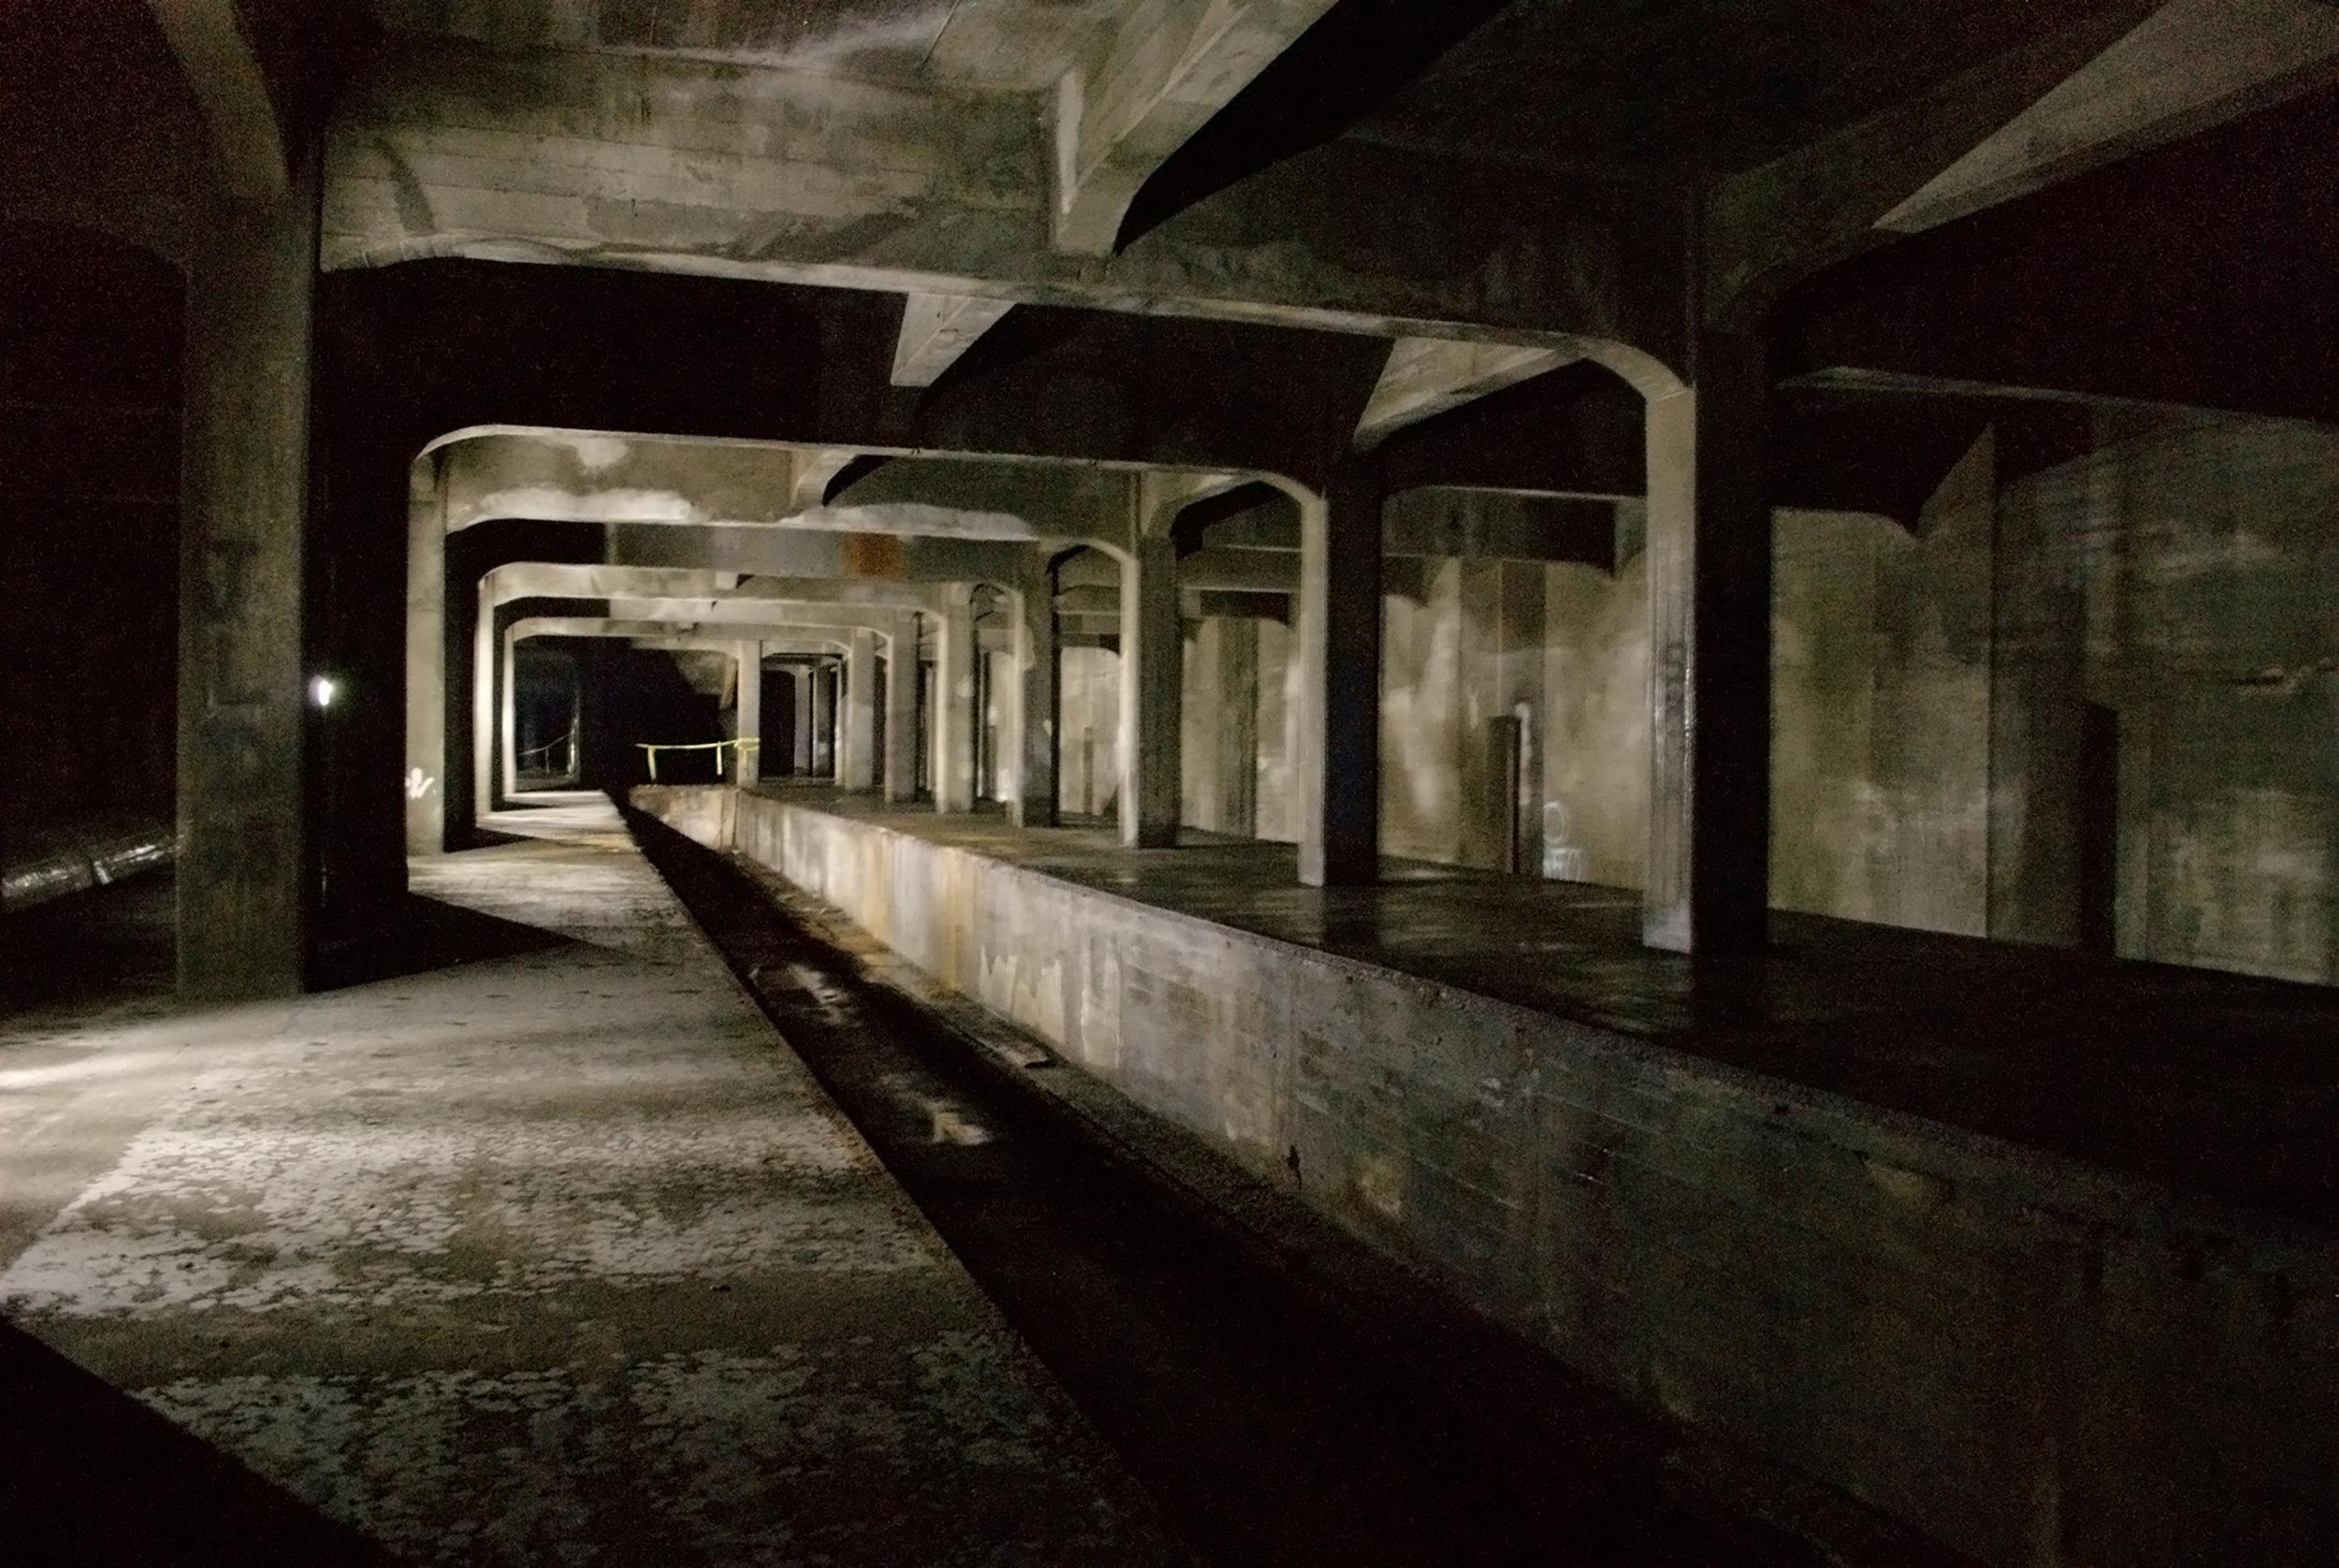 160409-berg-cincinnati-subway-embed_a4ncdp.jpg